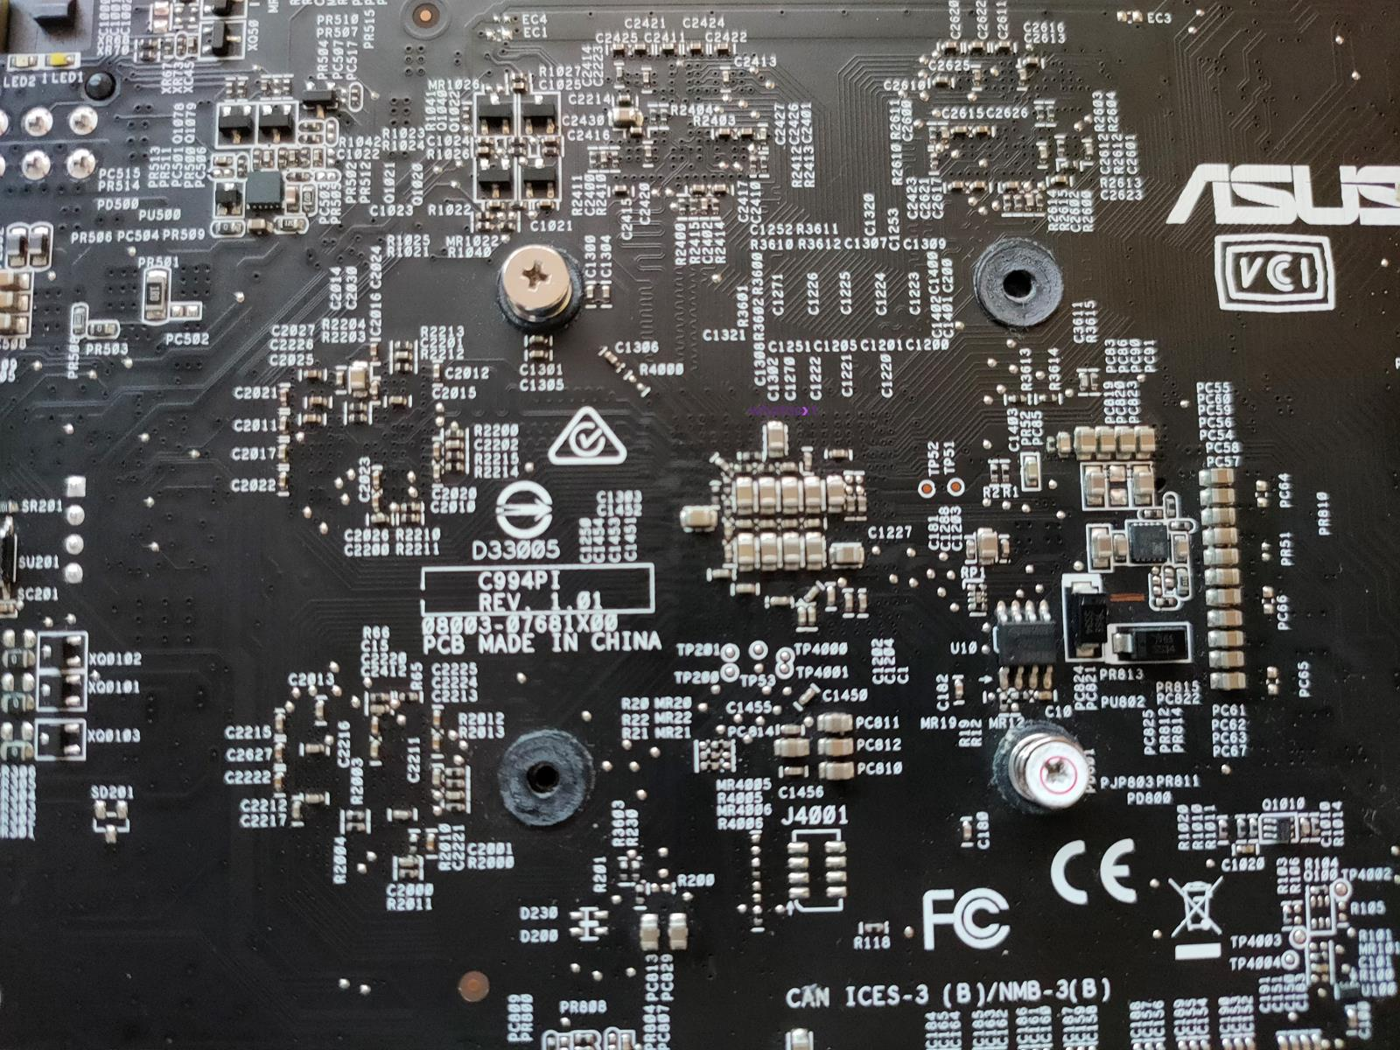 zmiana pasty ASUS ROG Strix RX 460, pasta termoprzewodząca ASUS ROG Strix RX 460, zmiana pasty karta graficzna